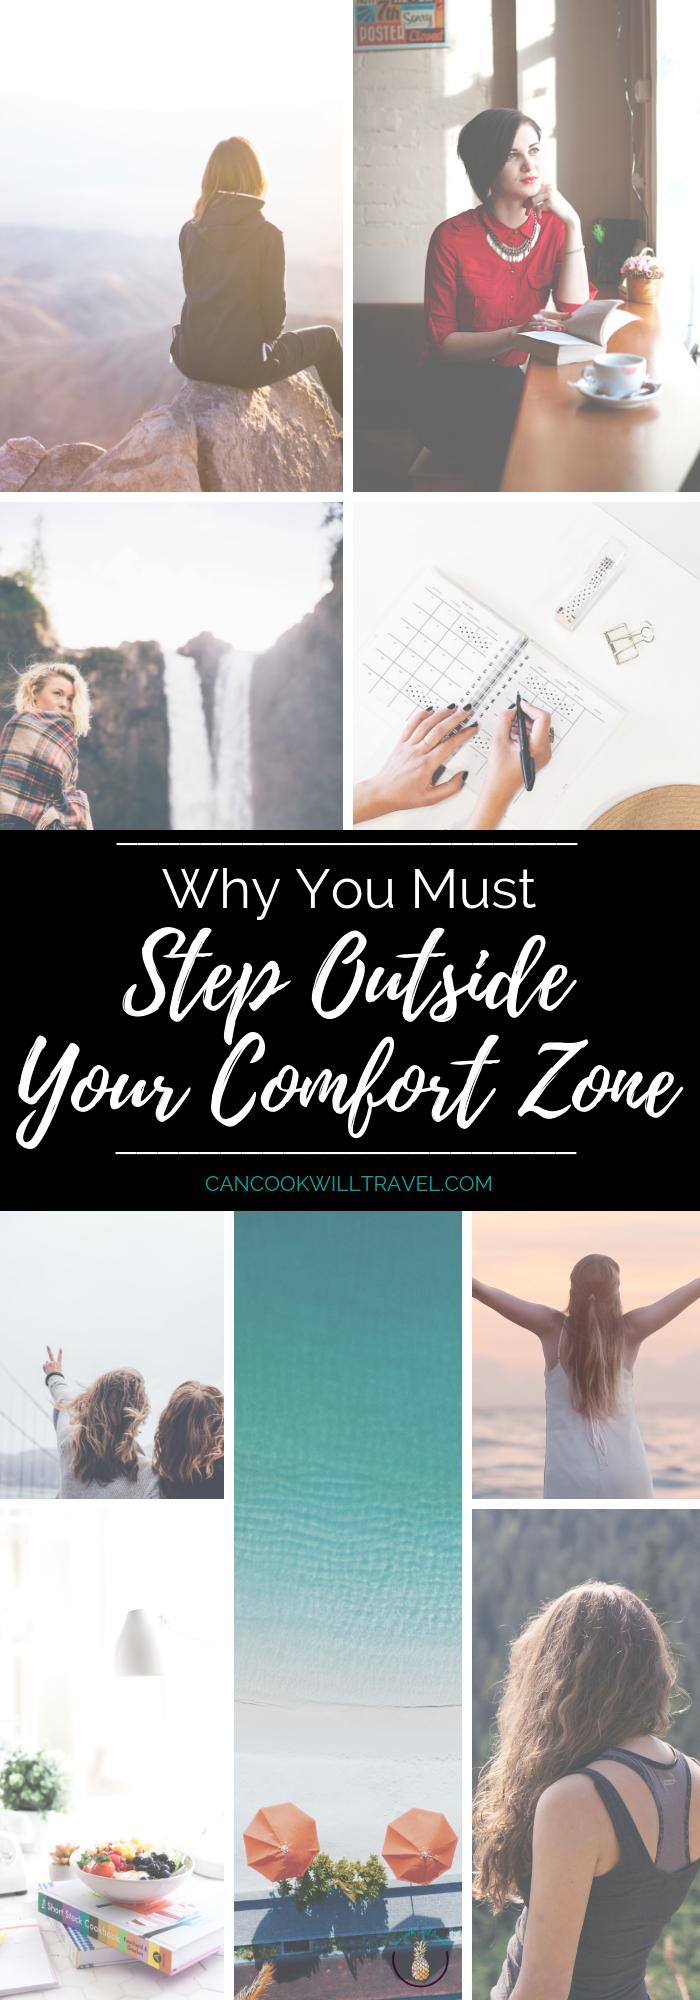 Comfort Zone_Tall